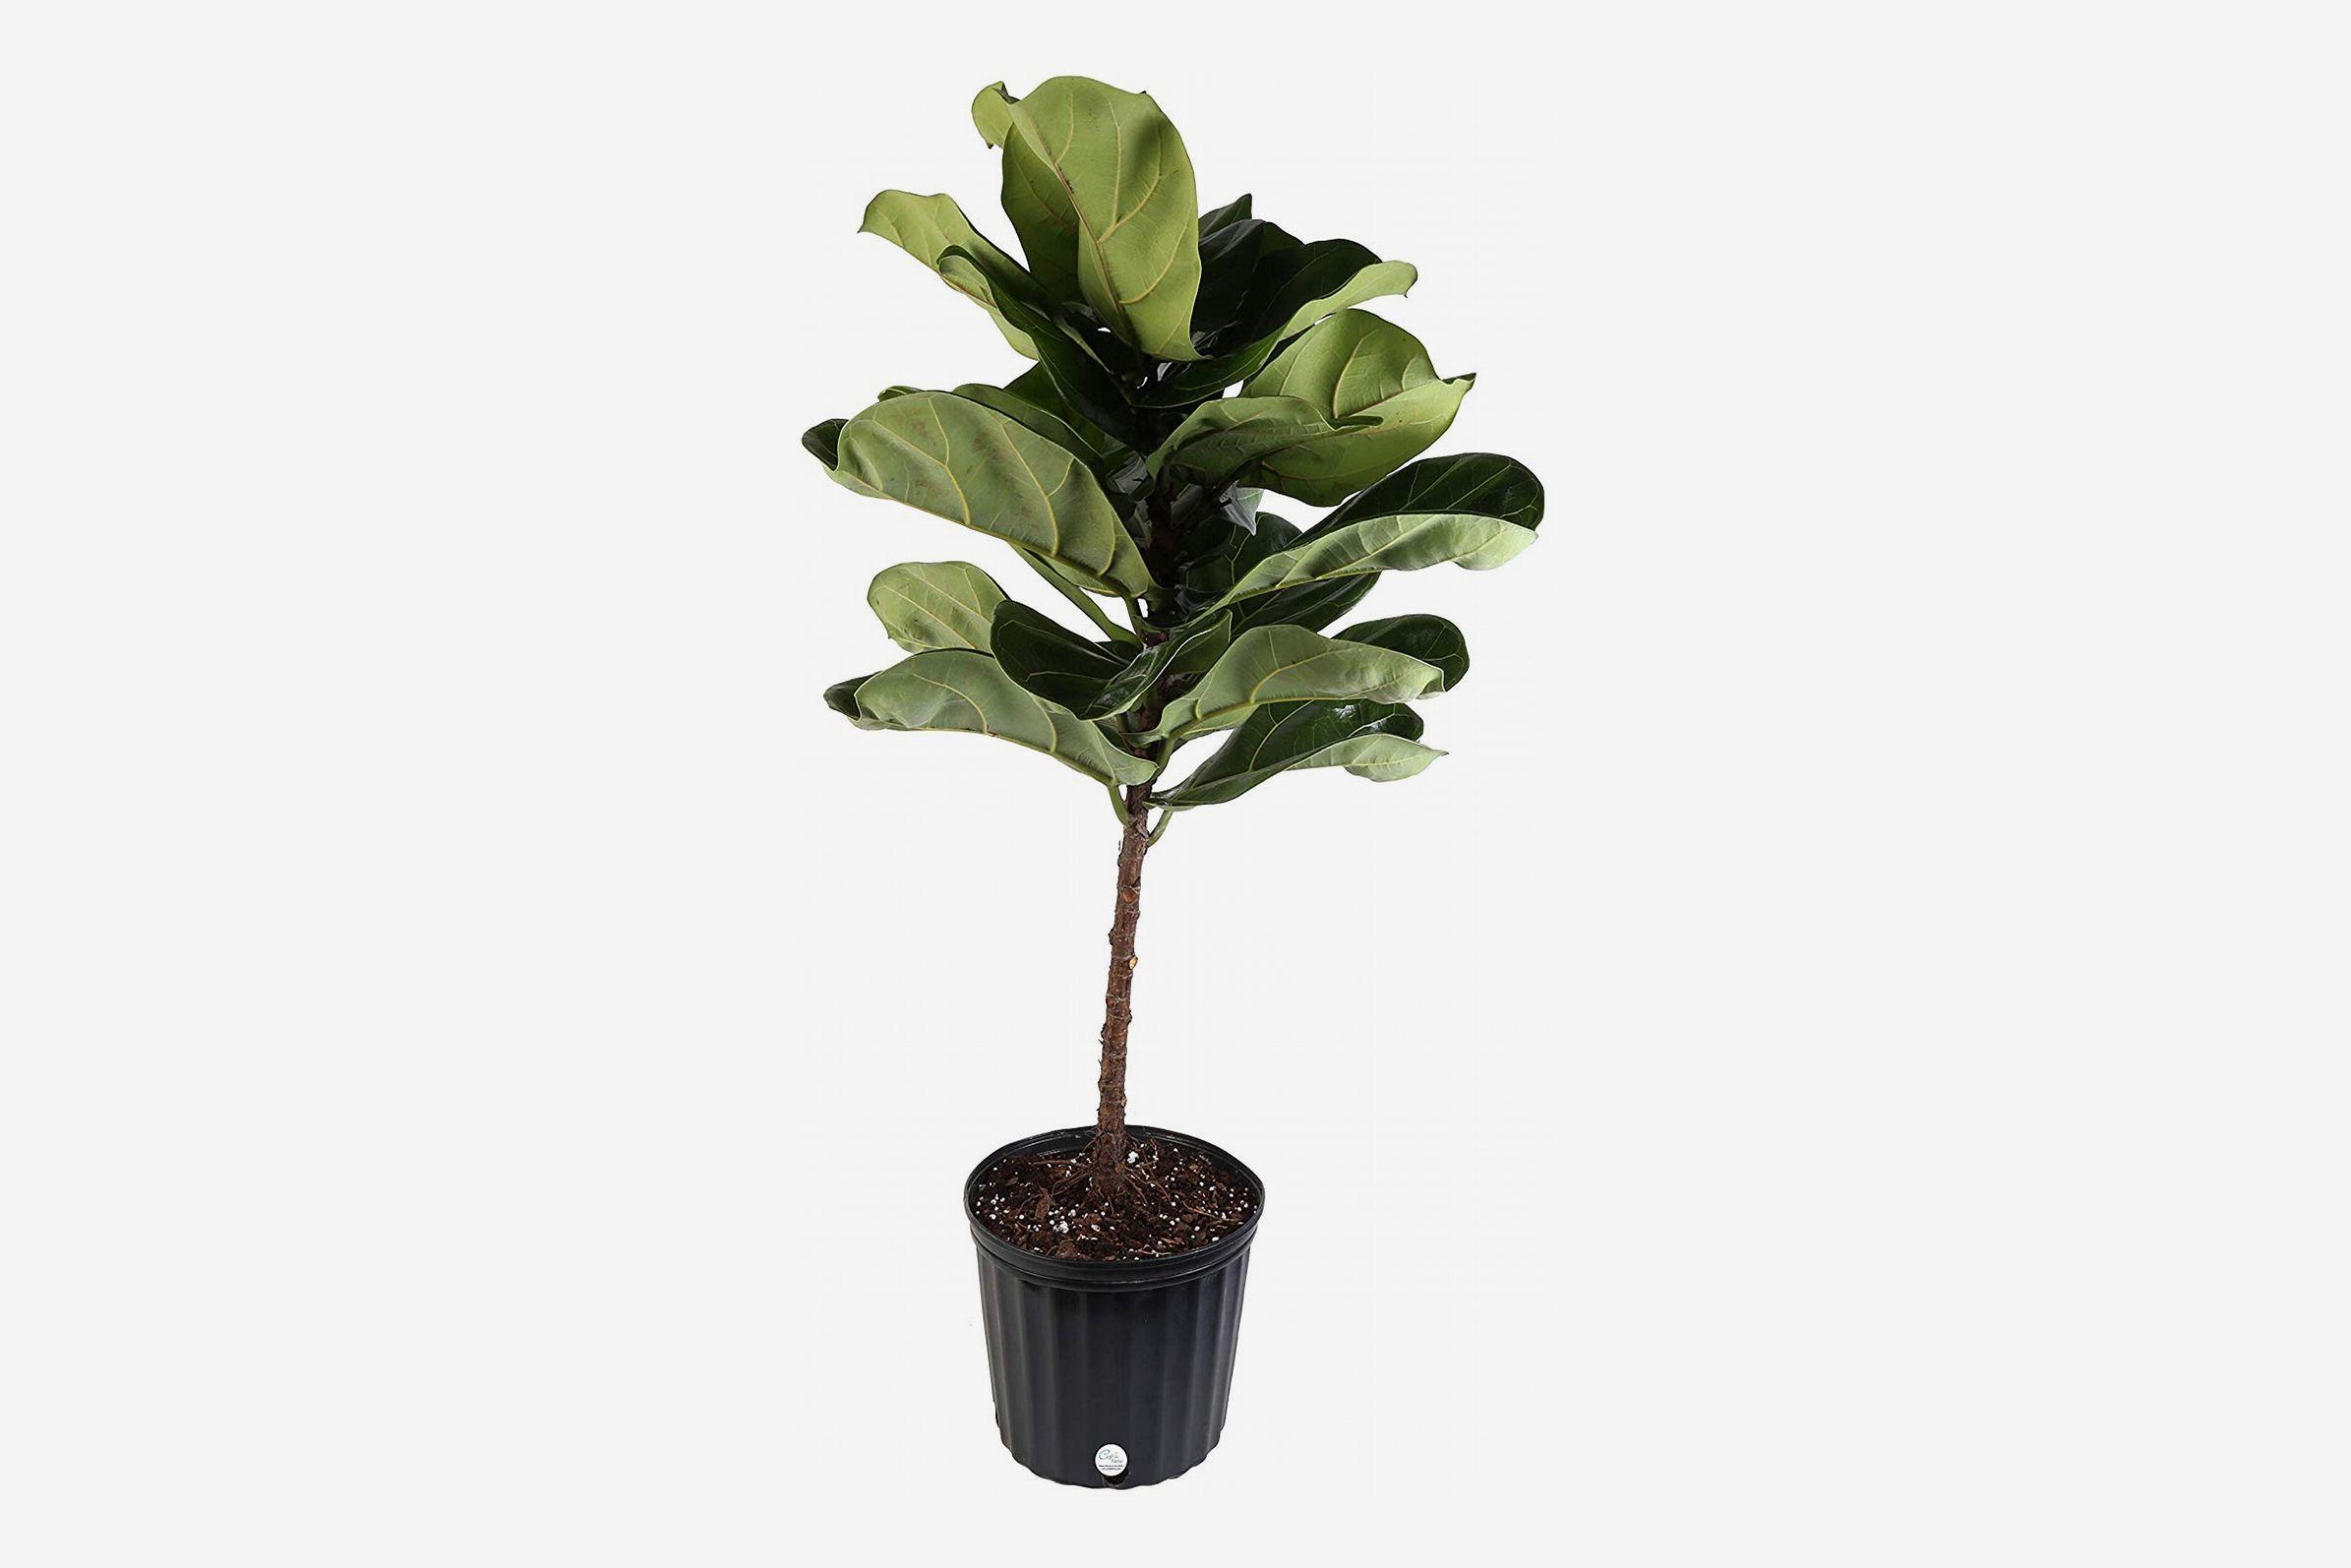 Costa Farms Fiddle-Leaf Fig Tree in Grower's Pot, 4-Feet Tall